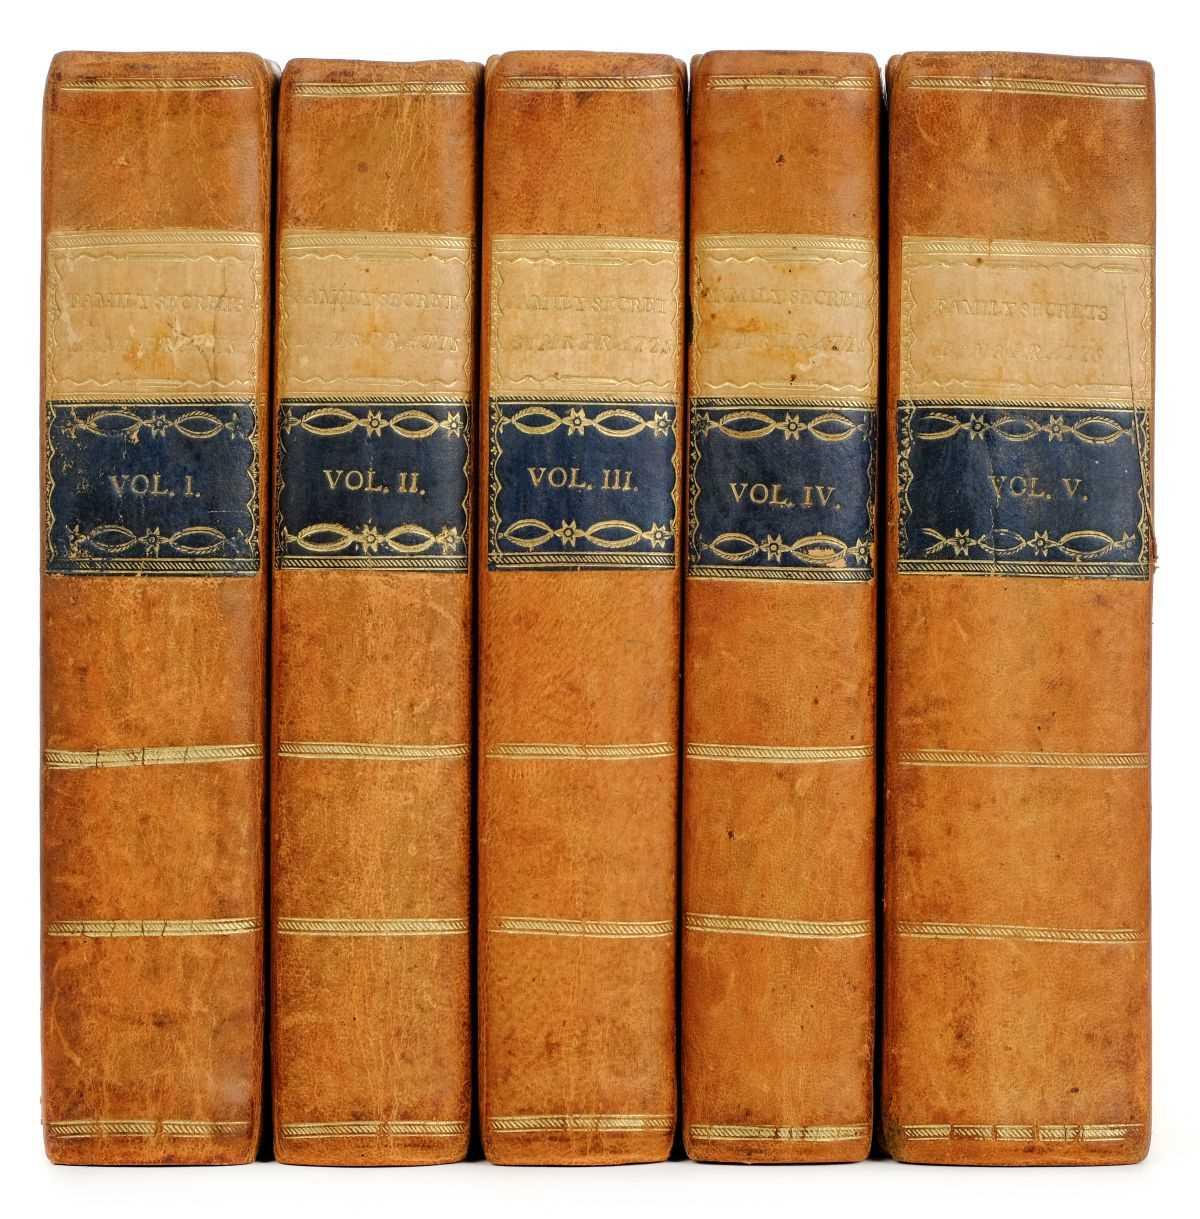 Lot 324 - Pratt [Samuel Jackson]. Family Secrets, 5 volumes, 1st edition, 1797